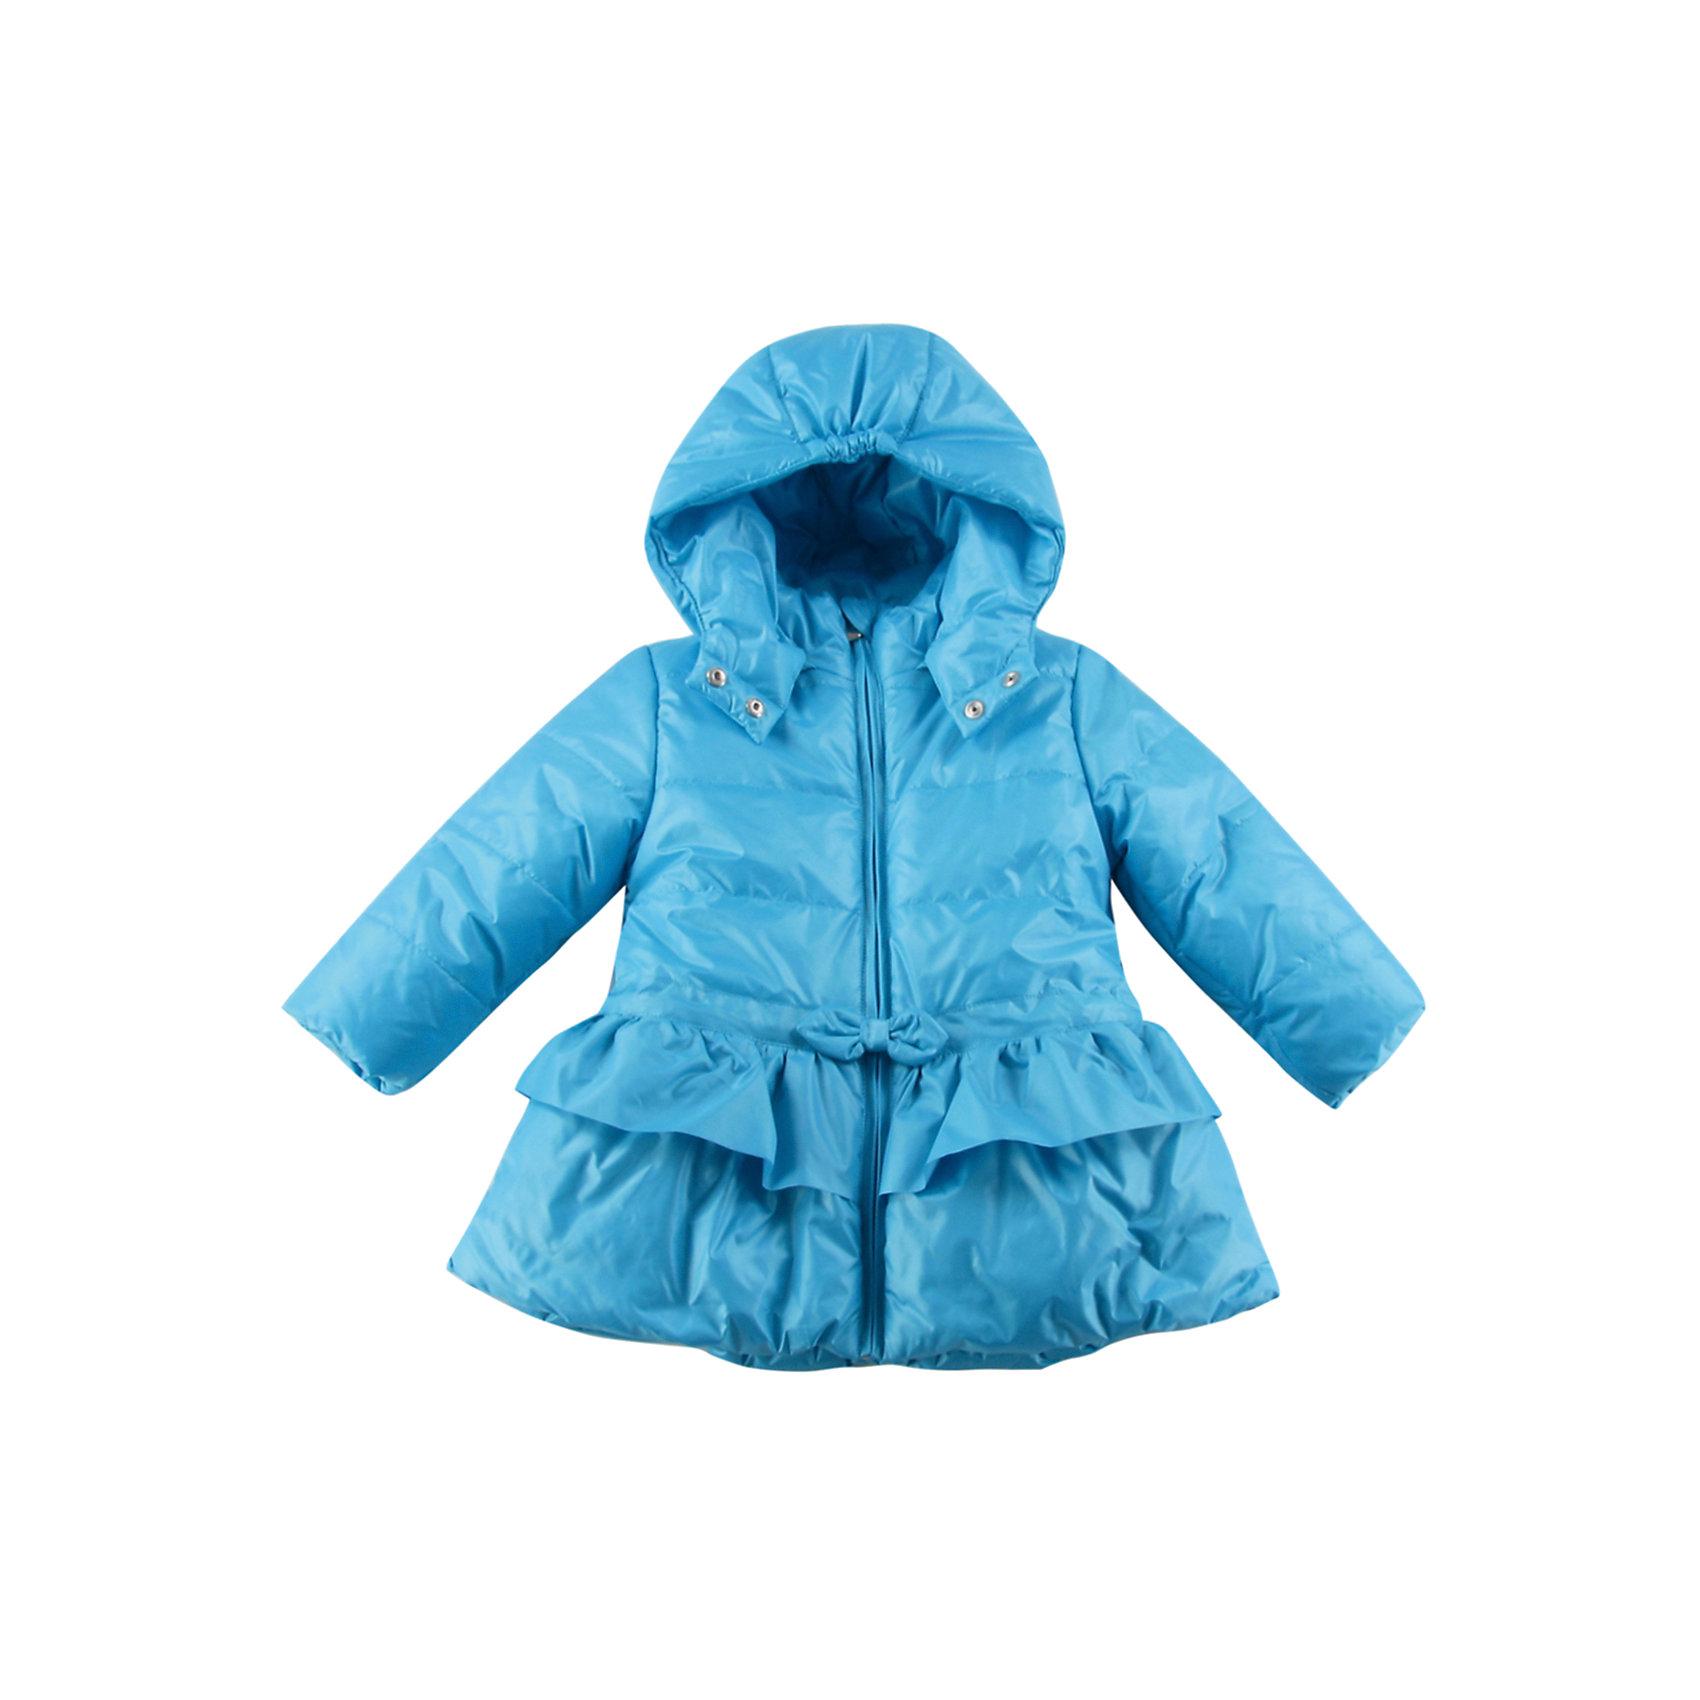 Куртка утепленная для девочки WojcikВерхняя одежда<br>Куртка утепленная для девочки Wojcik<br>Состав:<br>Полиэстер 100%<br><br>Ширина мм: 356<br>Глубина мм: 10<br>Высота мм: 245<br>Вес г: 519<br>Цвет: голубой<br>Возраст от месяцев: 24<br>Возраст до месяцев: 36<br>Пол: Женский<br>Возраст: Детский<br>Размер: 98,74,80,86,92<br>SKU: 5590536